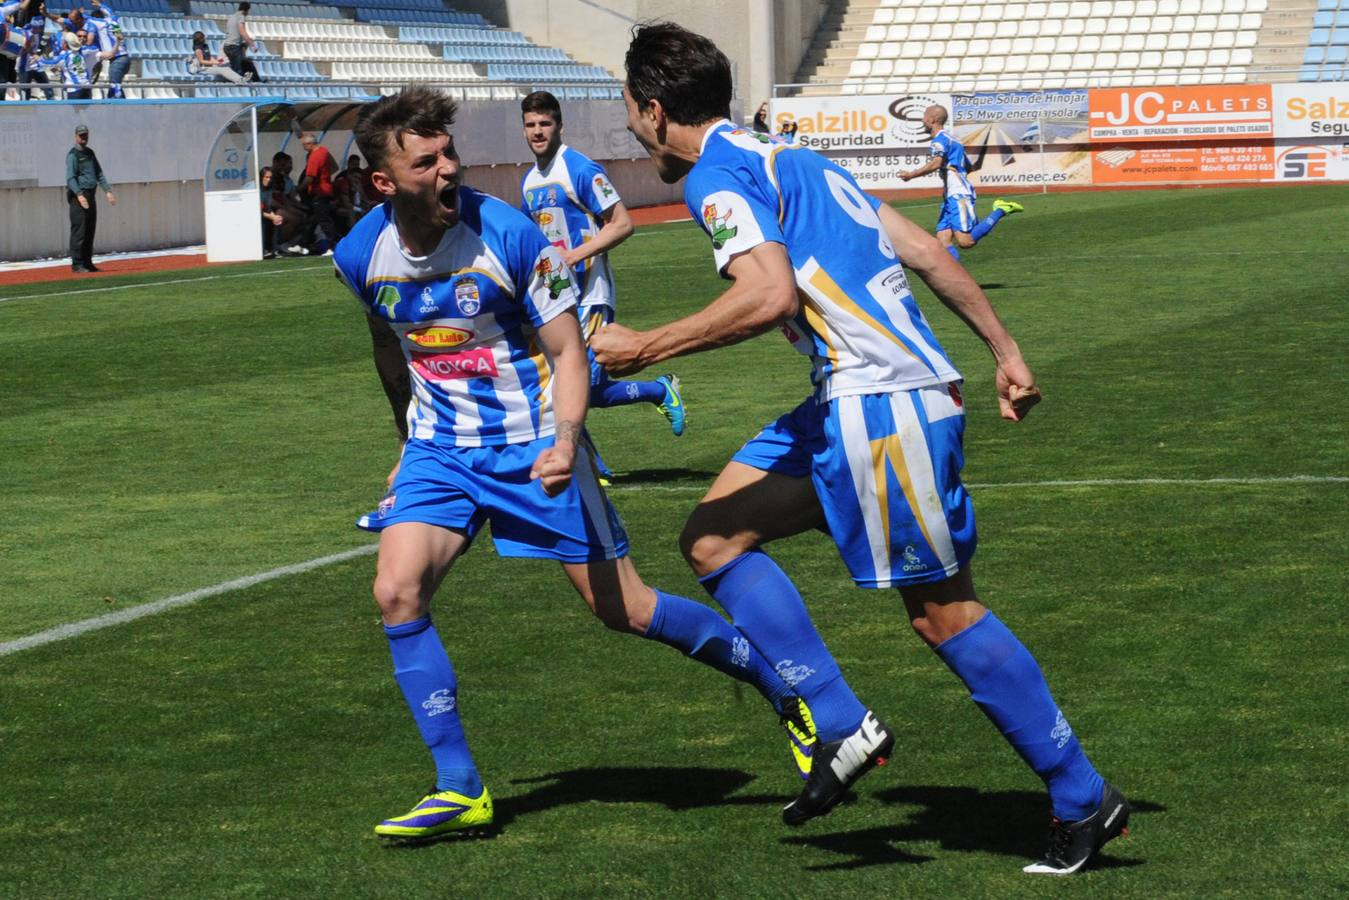 La Hoya Lorca 1-0 Lucena